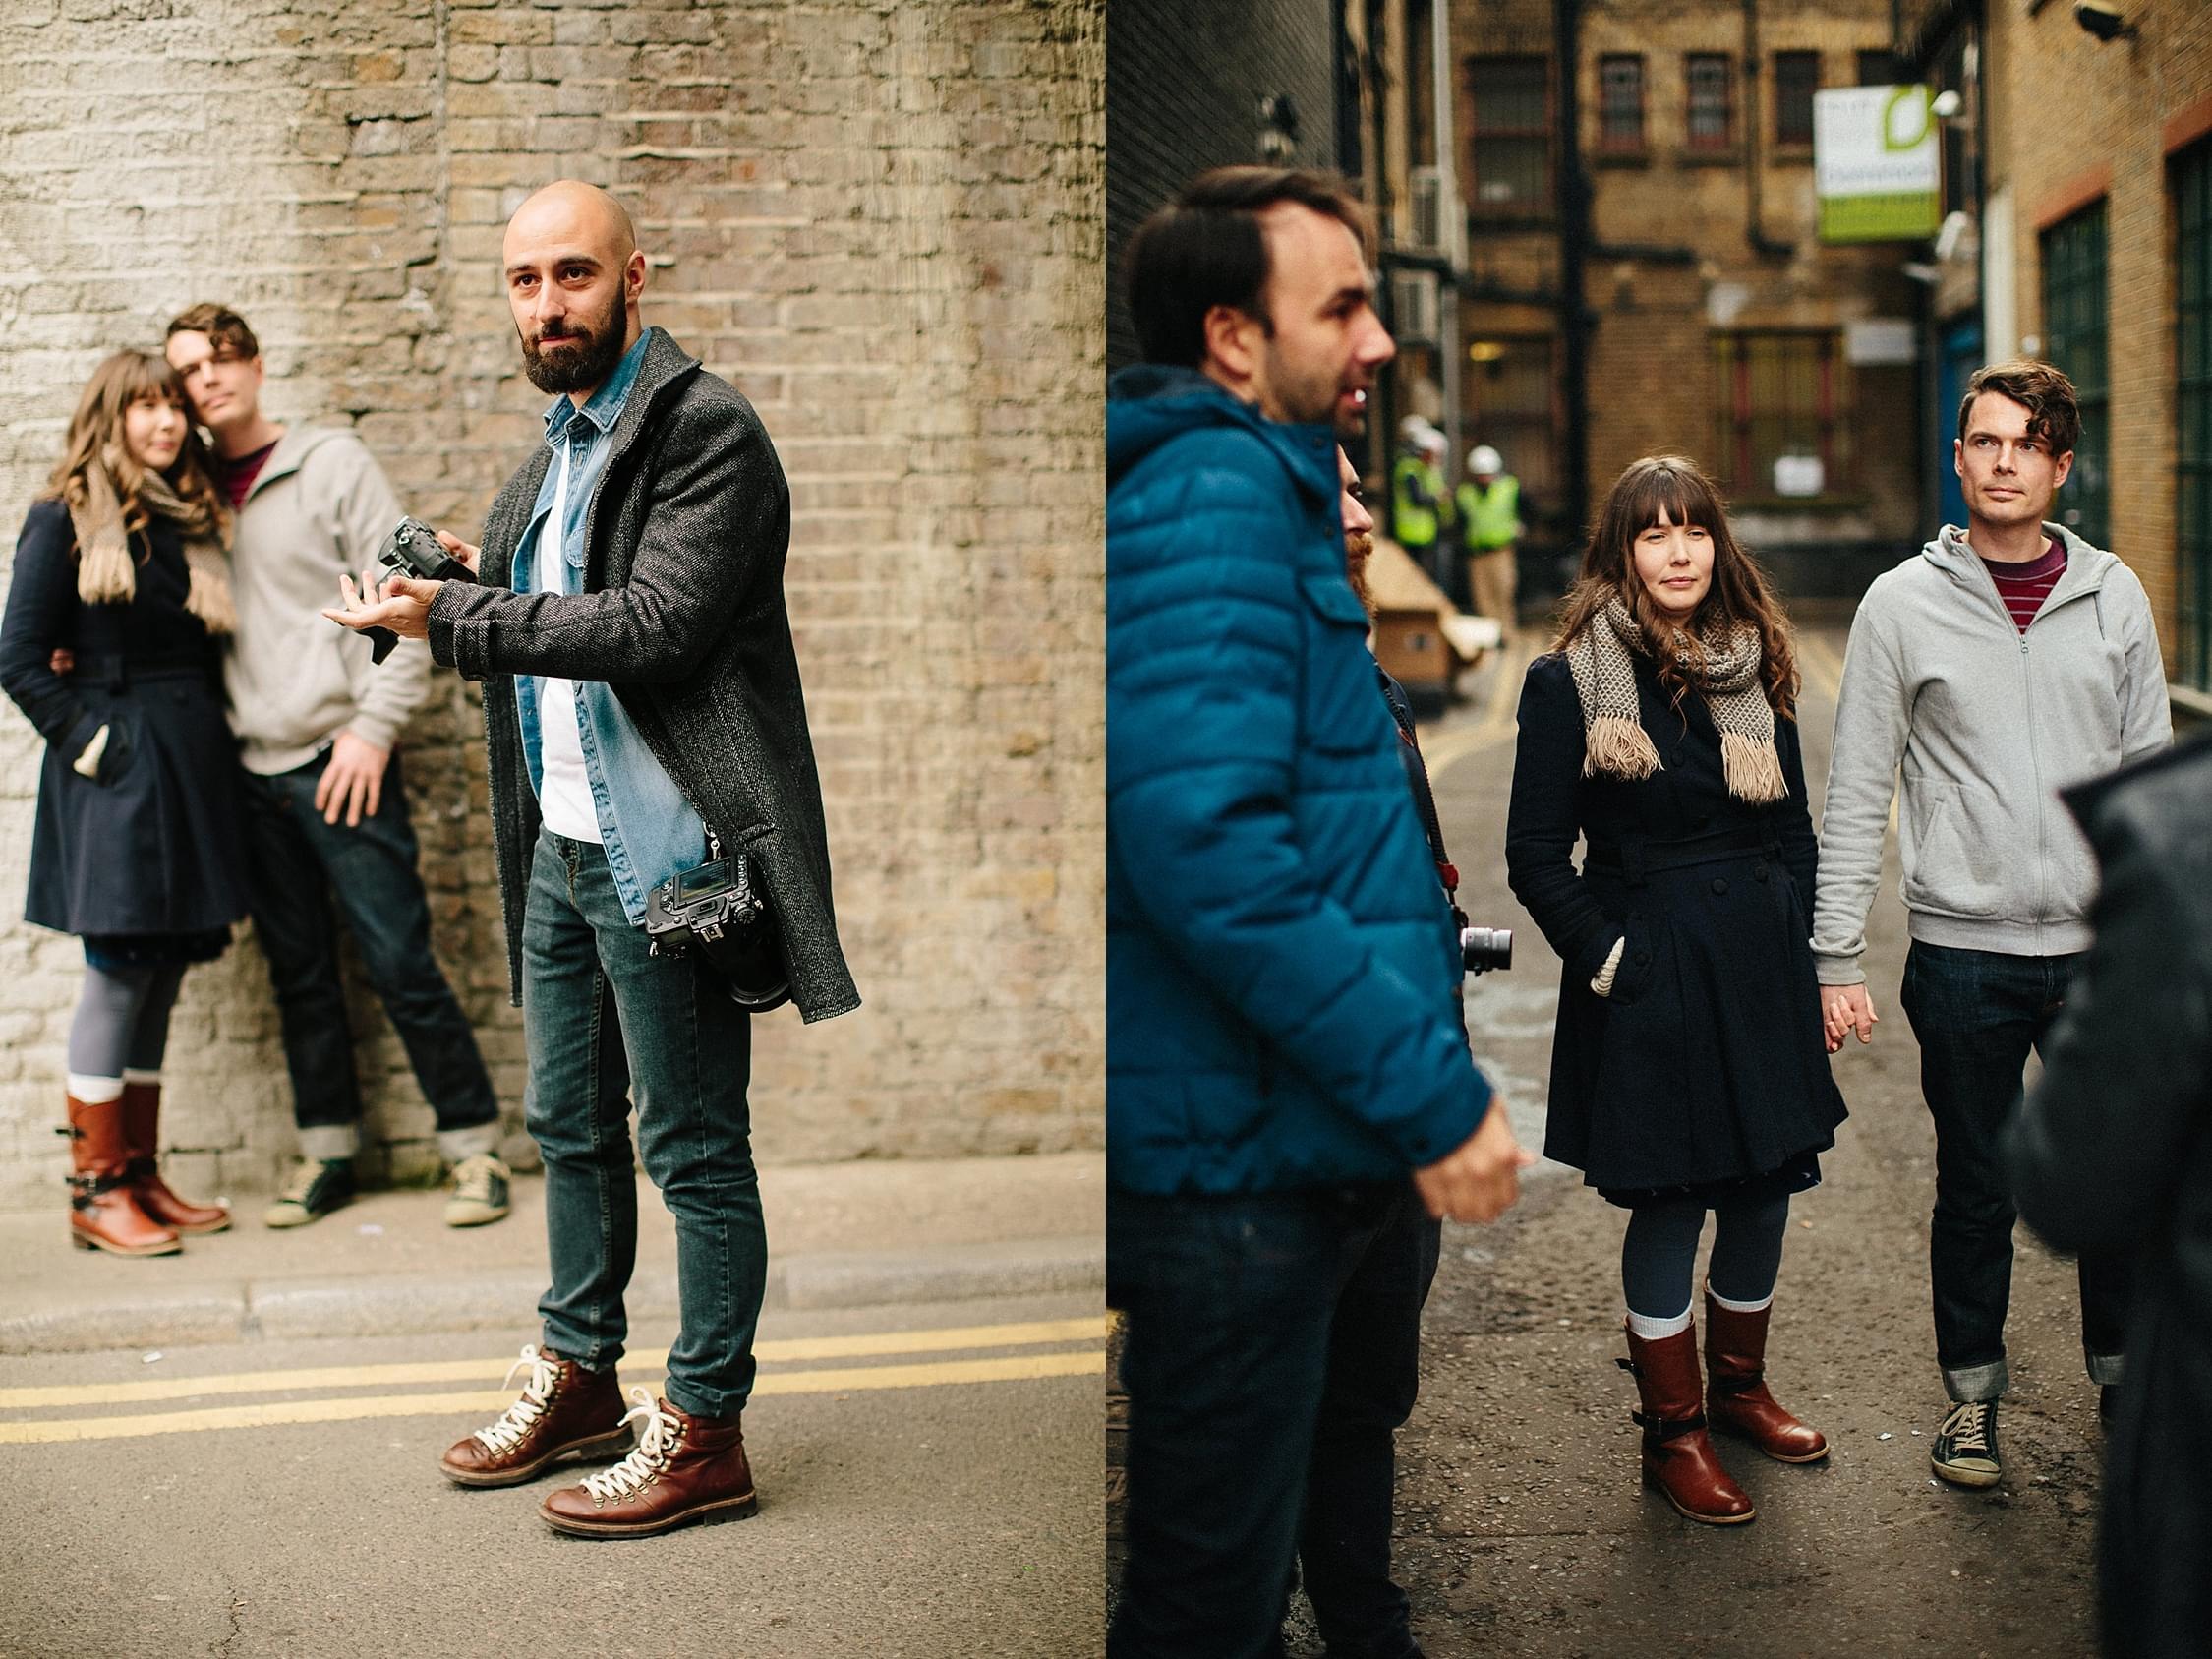 share-the-journey-london-wedding-photography-workshop-15